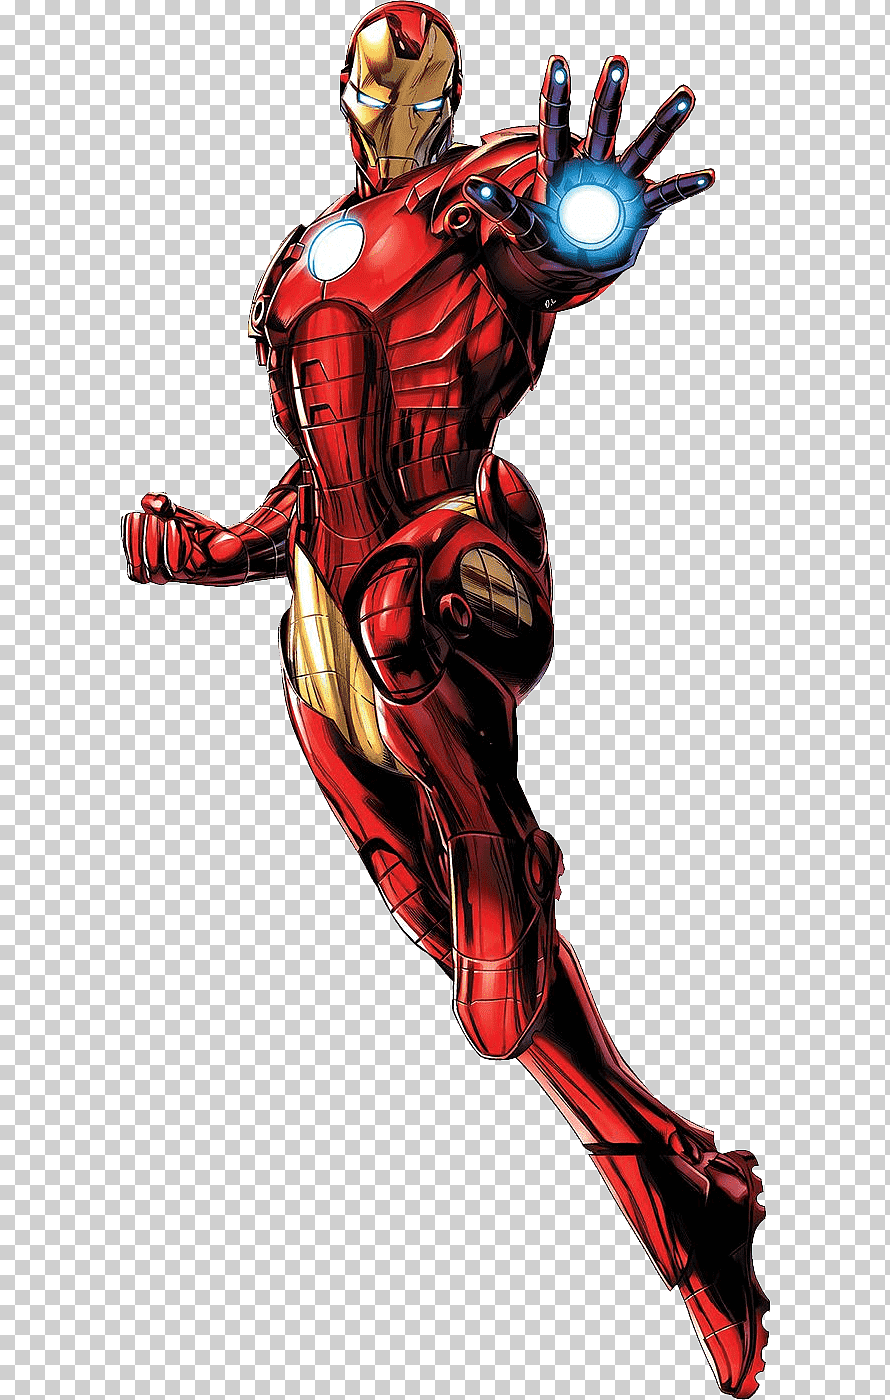 Marvel Iron Man Illustration Iron Man Thor Captain America Hulk Black Widow Ironman Heroes Avengers Su In 2021 Iron Man Flying Man Illustration Iron Man Superhero